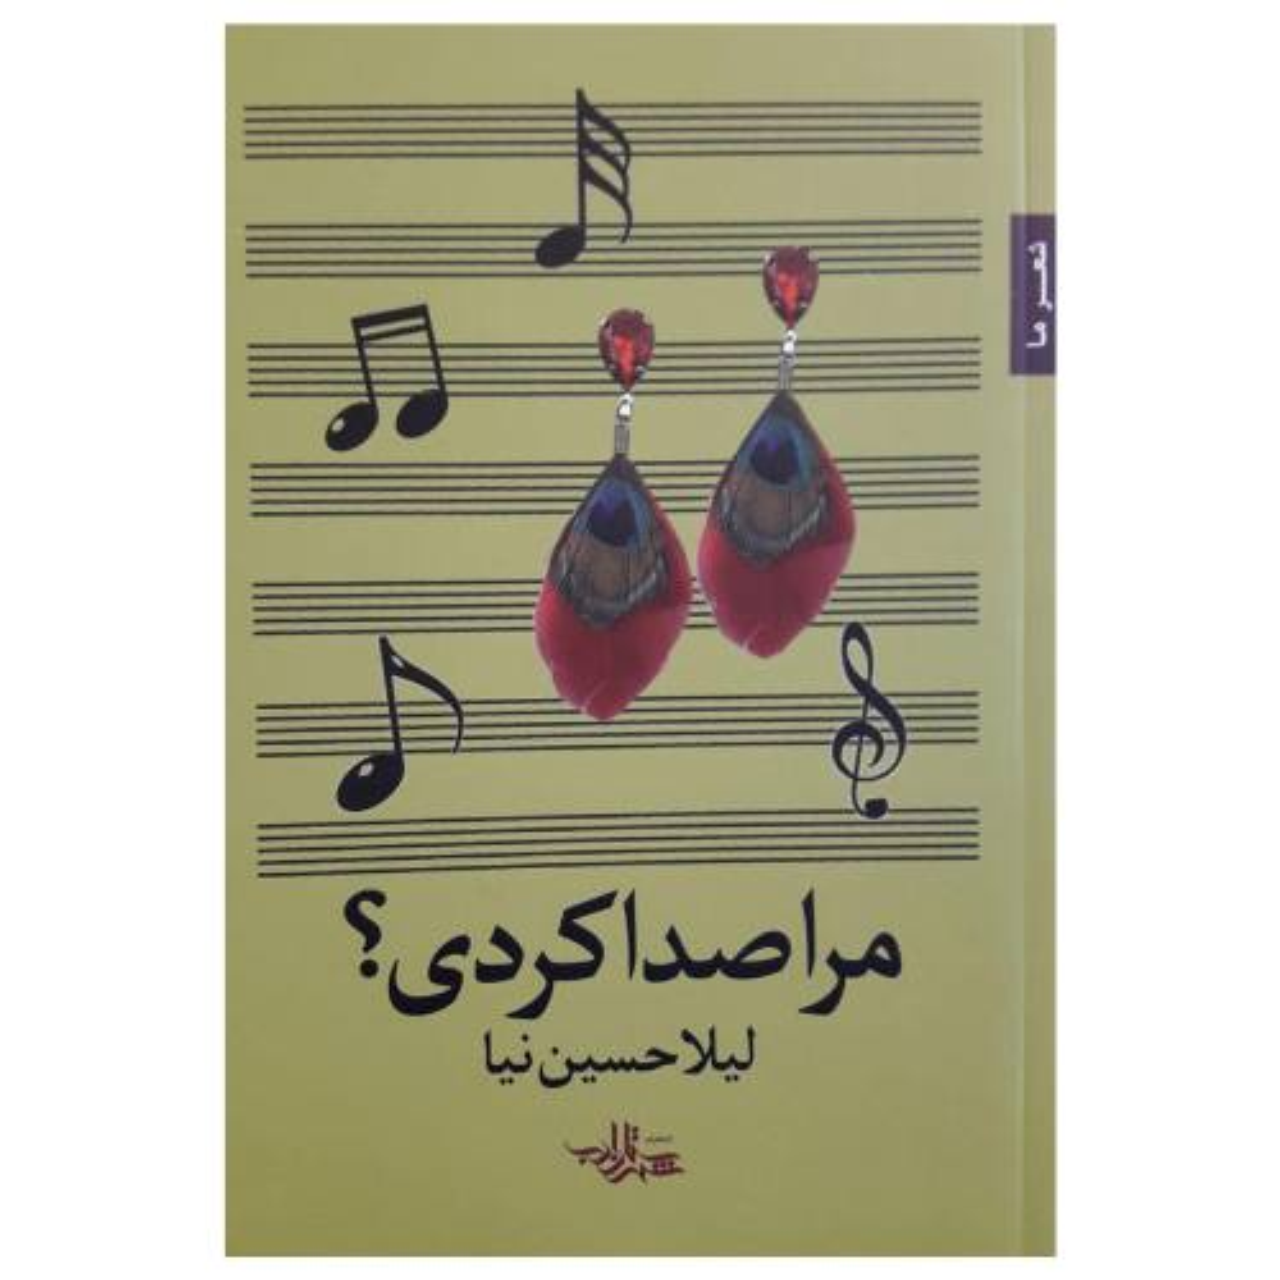 کتاب مرا صدا کردی اثر لیلا حسین نیا